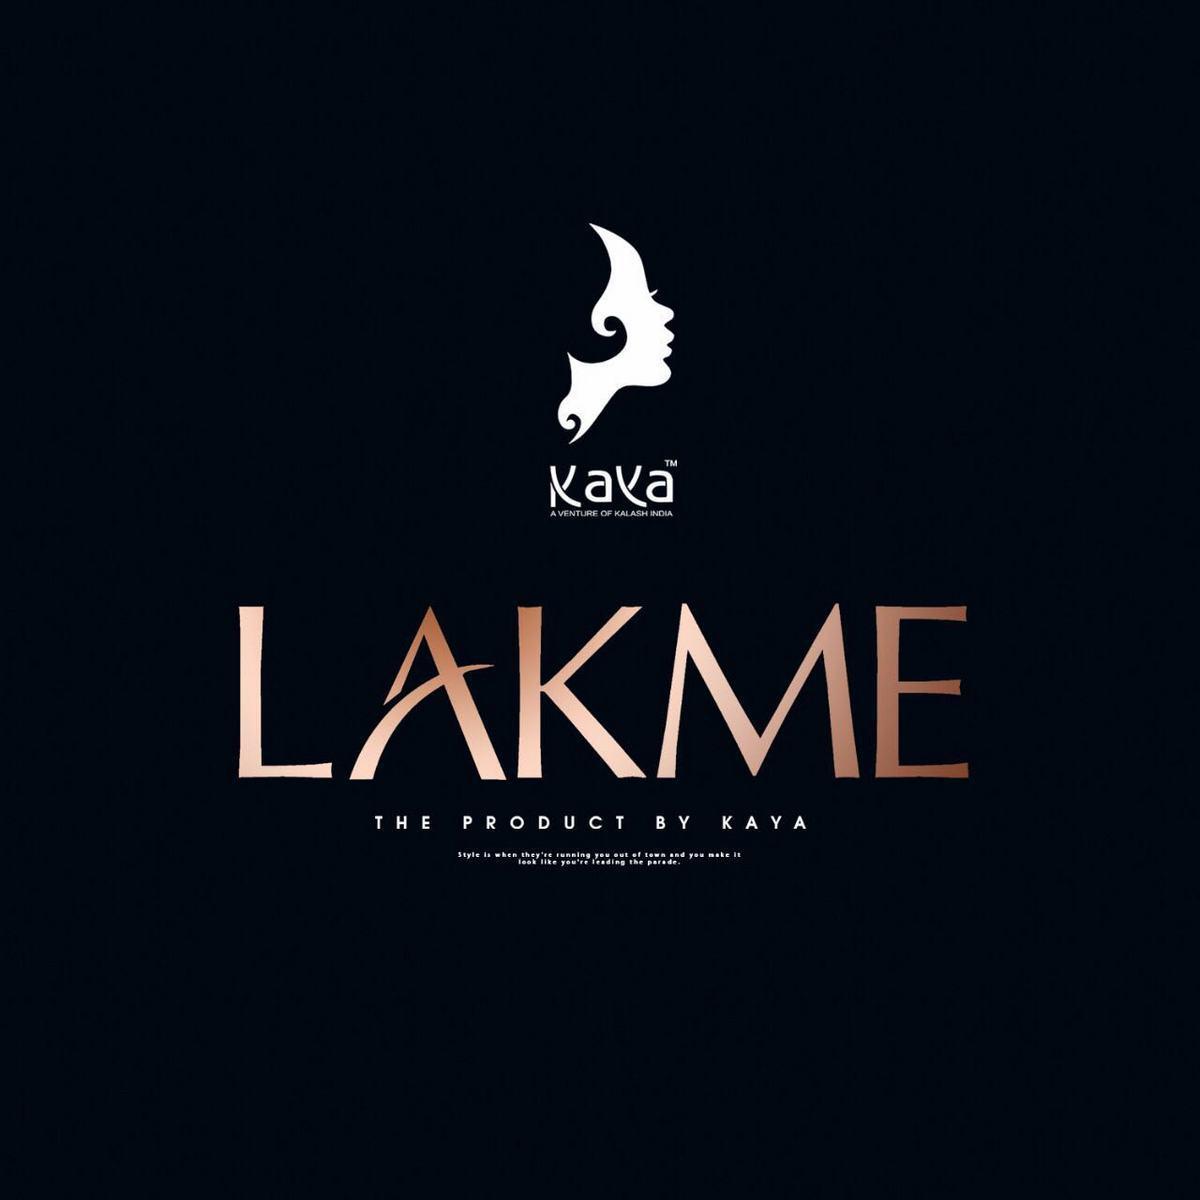 Marketing Mix Of Lakme